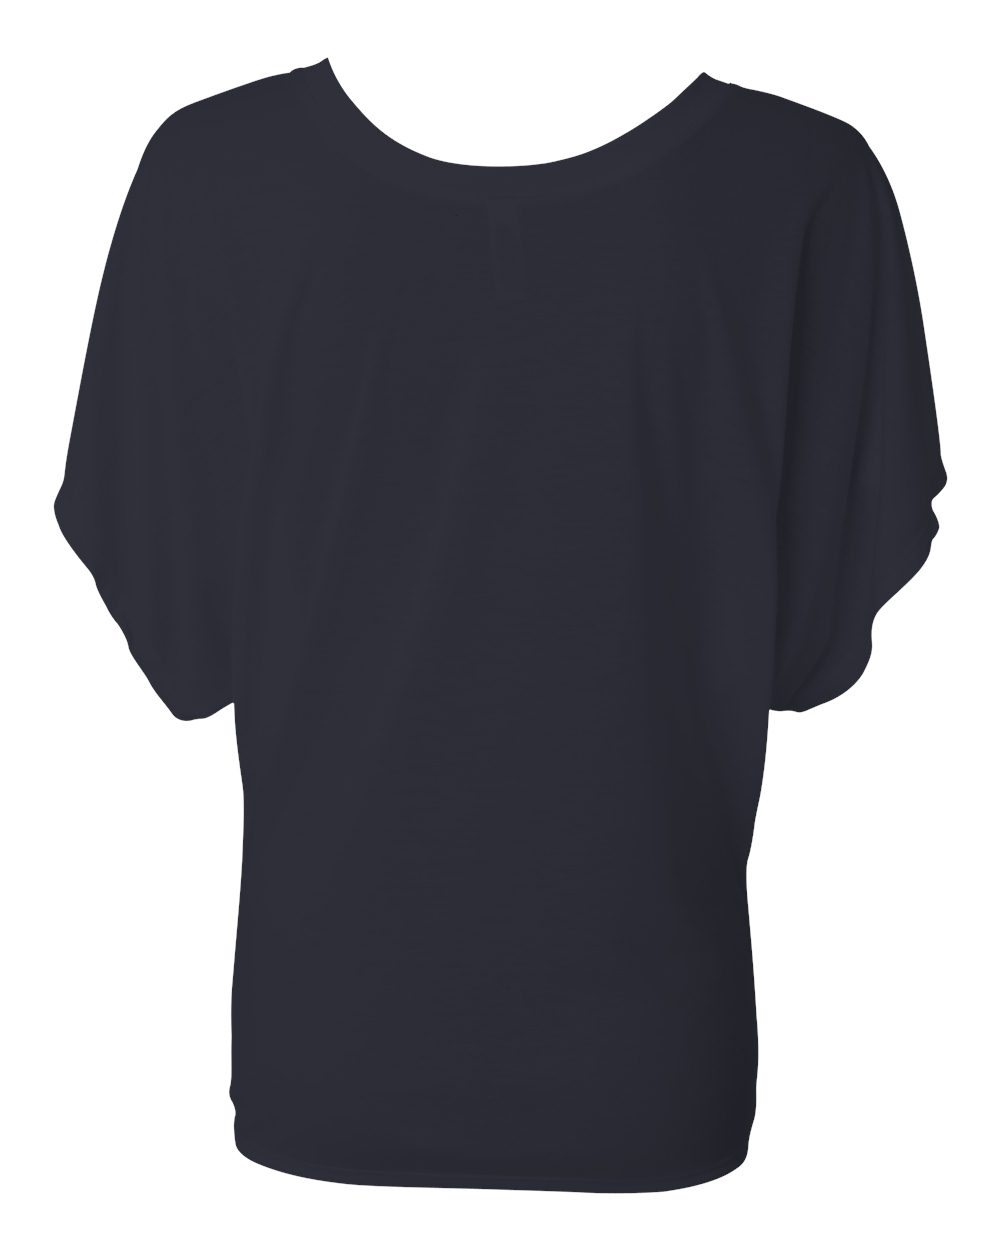 Bella-Canvas-Women-039-s-Flowy-Draped-Sleeve-Dolman-T-Shirt-8821-S-2XL thumbnail 25